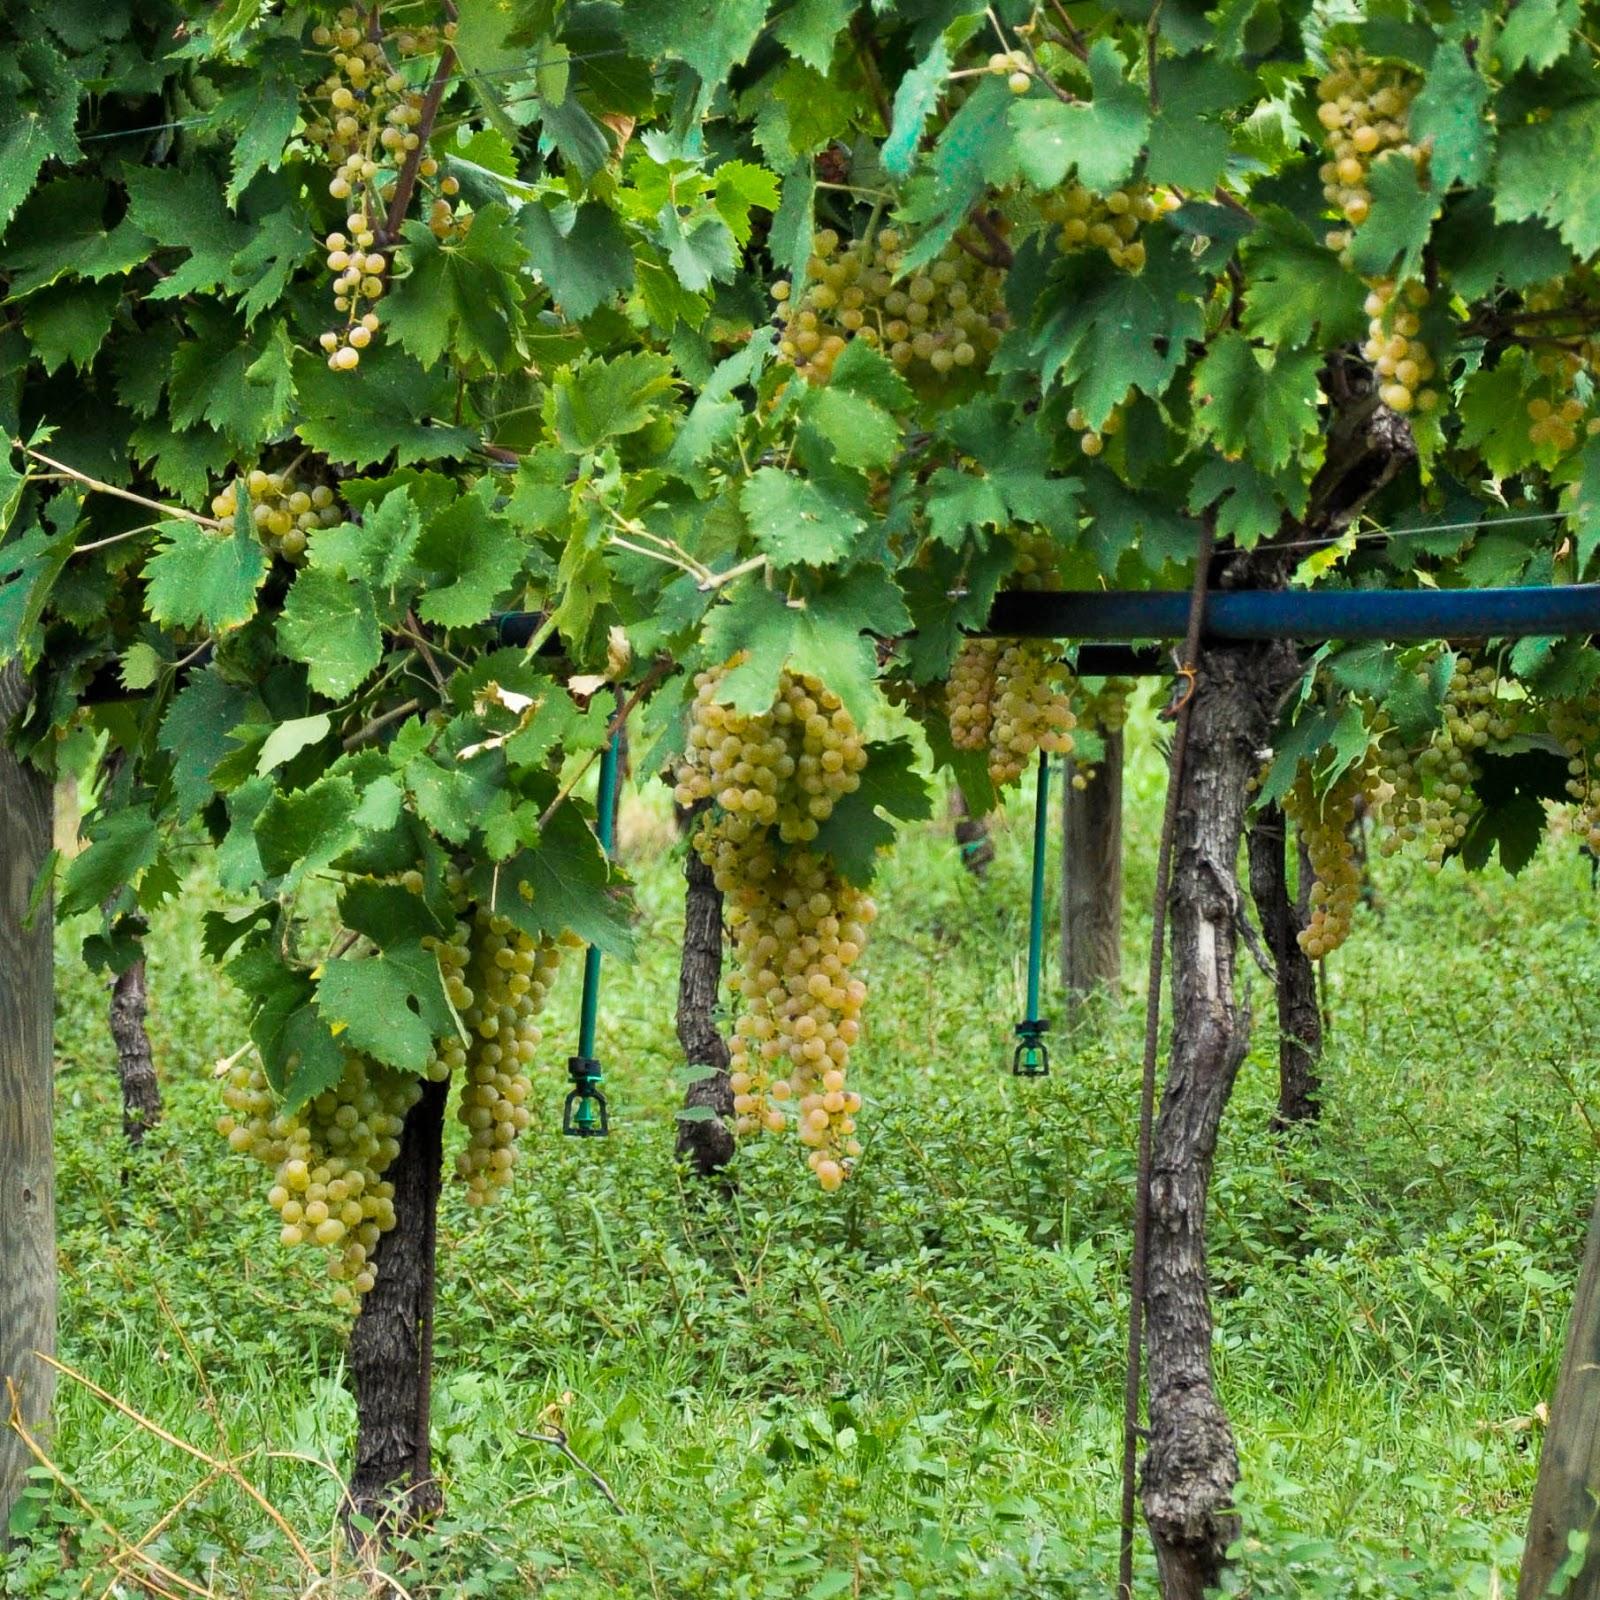 Grapes on the vine, Soave, Veneto, Italy